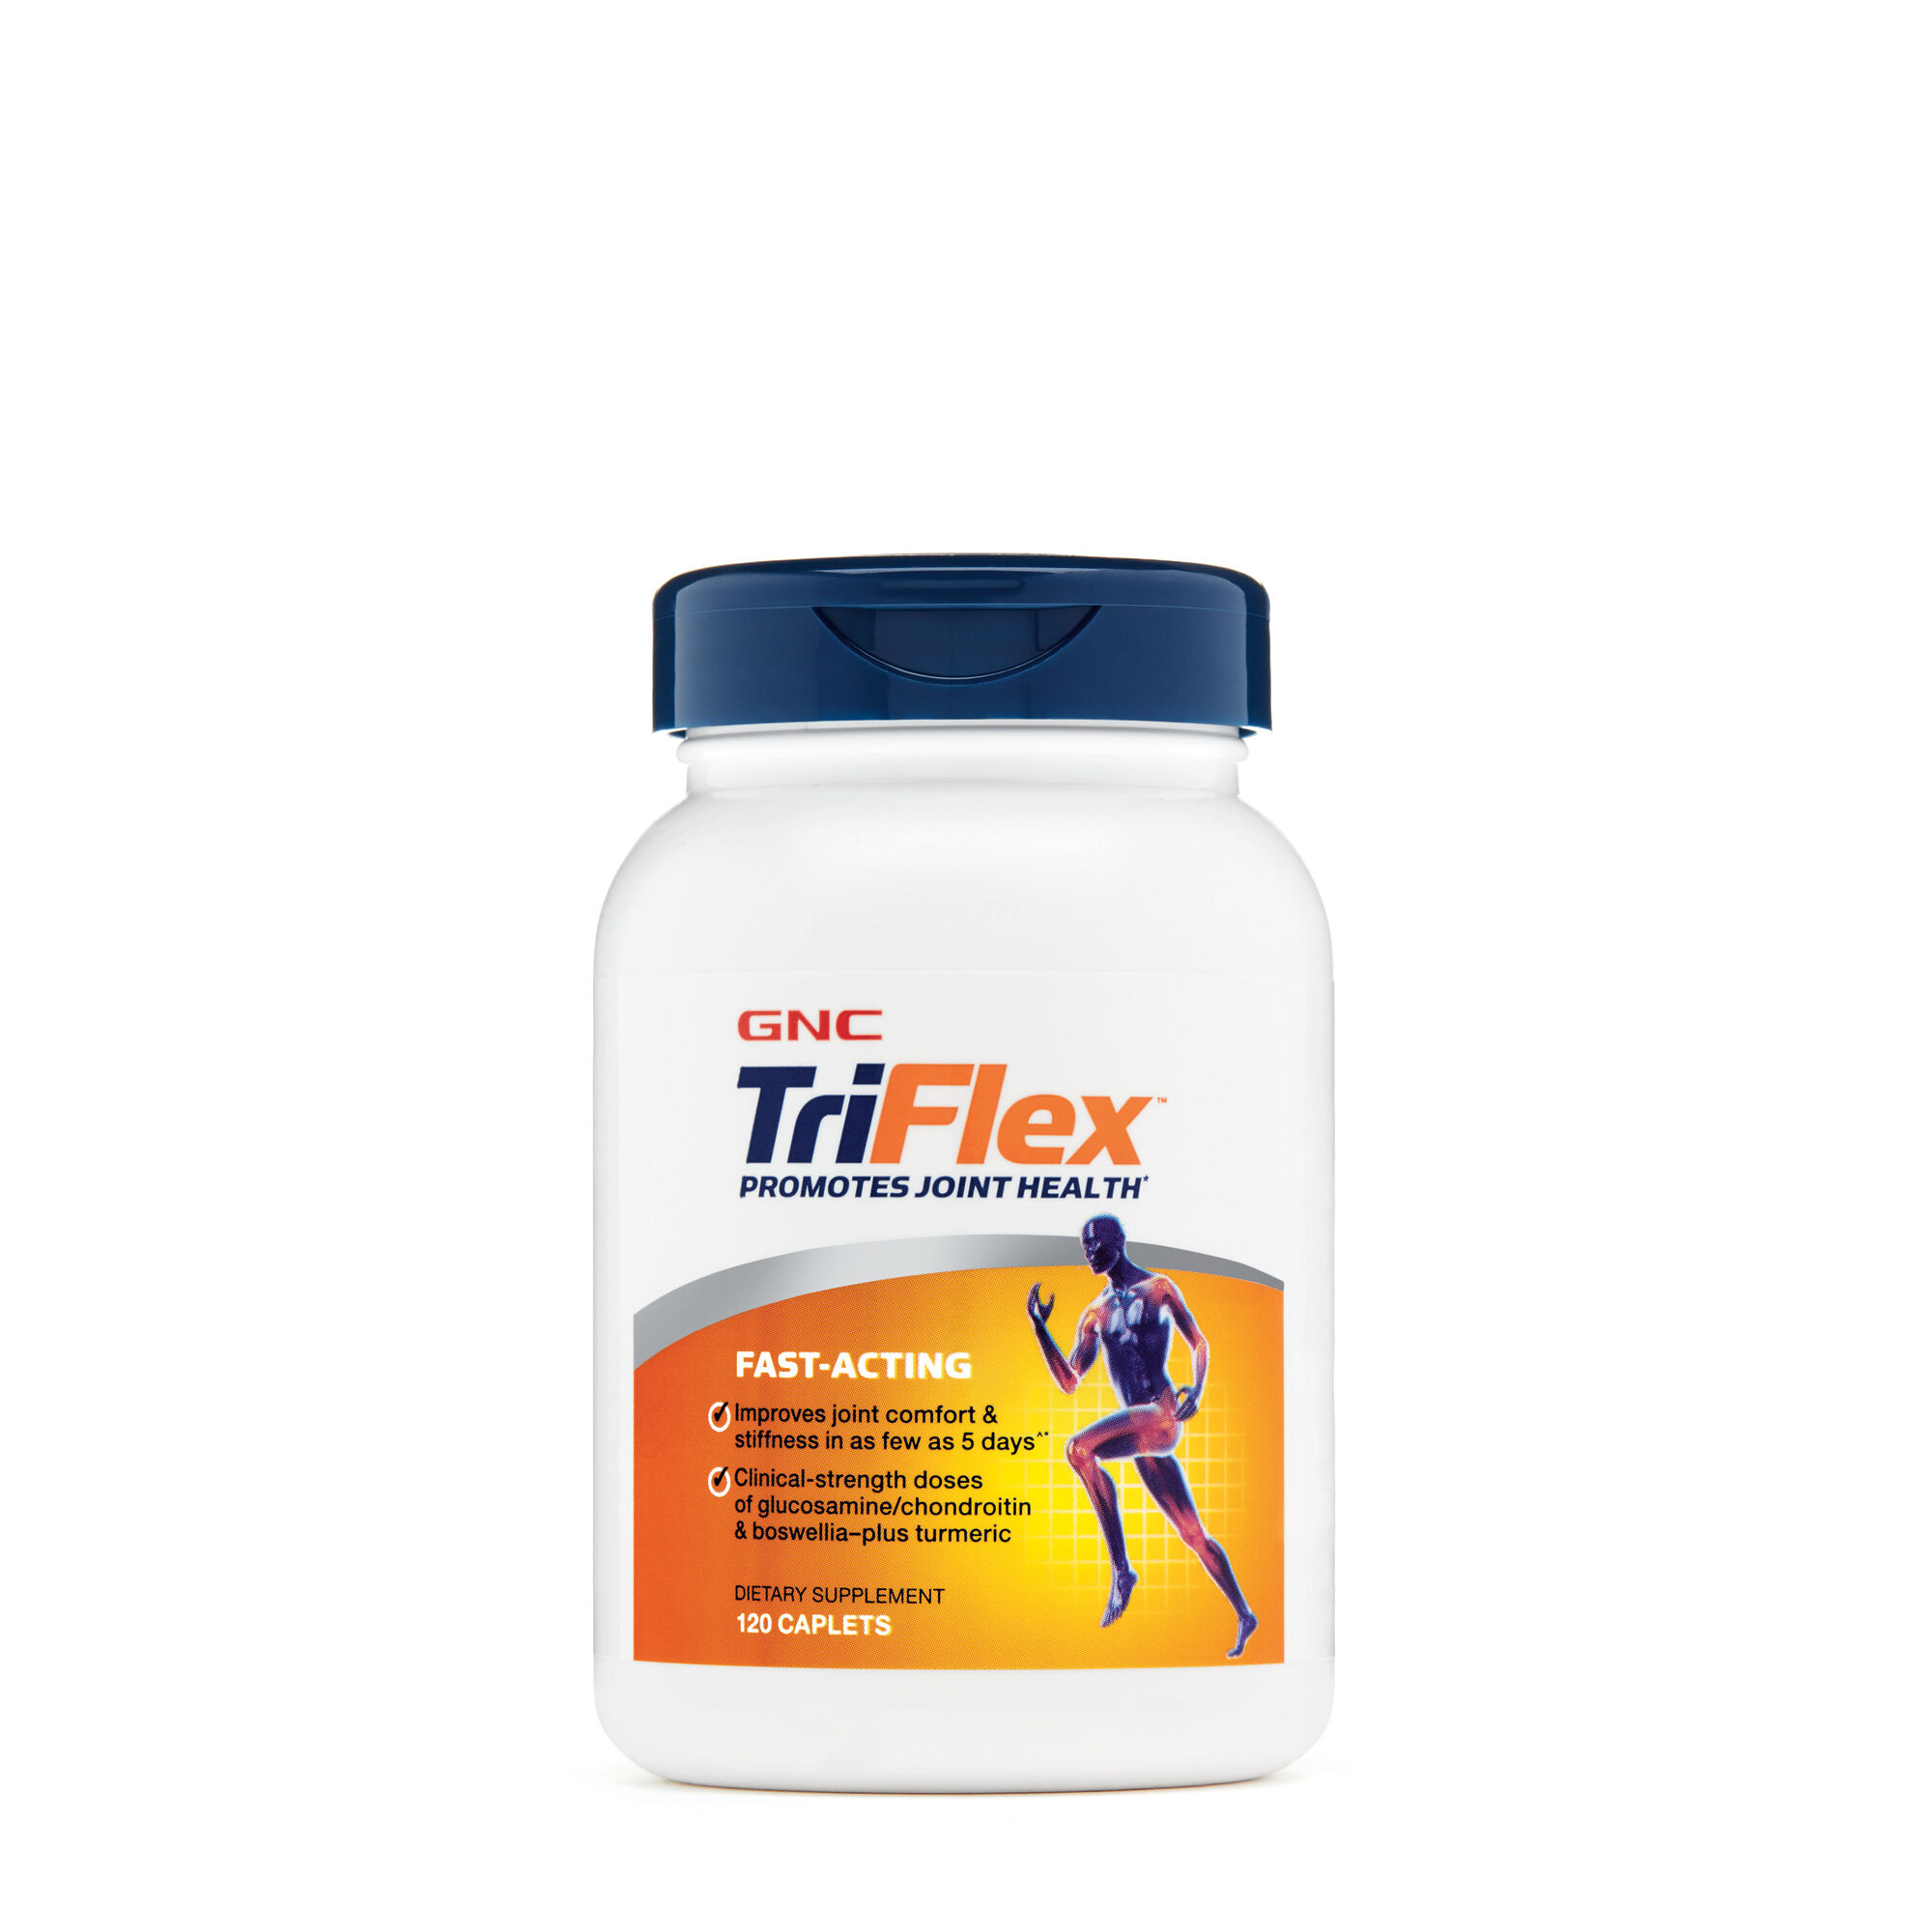 Triflex FAST-ACTING 120 Caplets, Glucosamina Condroitina Msm Glucosamine Chondroitin MSM, From USA хондроитин с глюкозамином